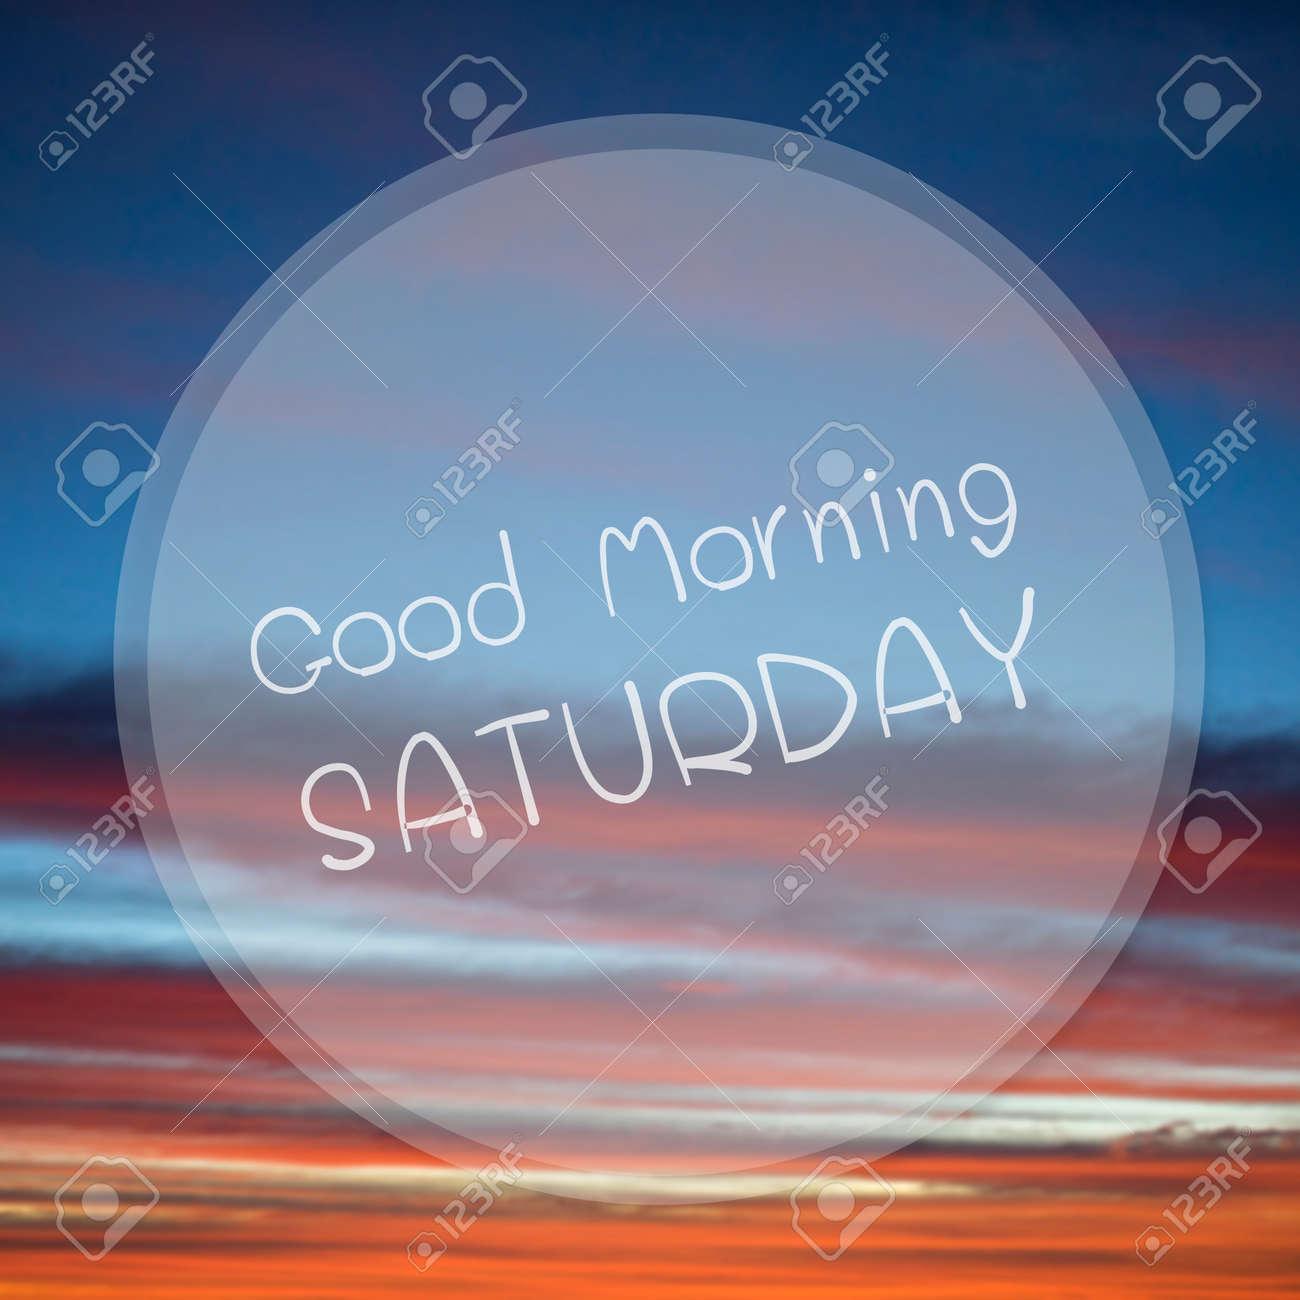 Good Morning Saturday On Sunrise Sky Blur Background Stock Photo